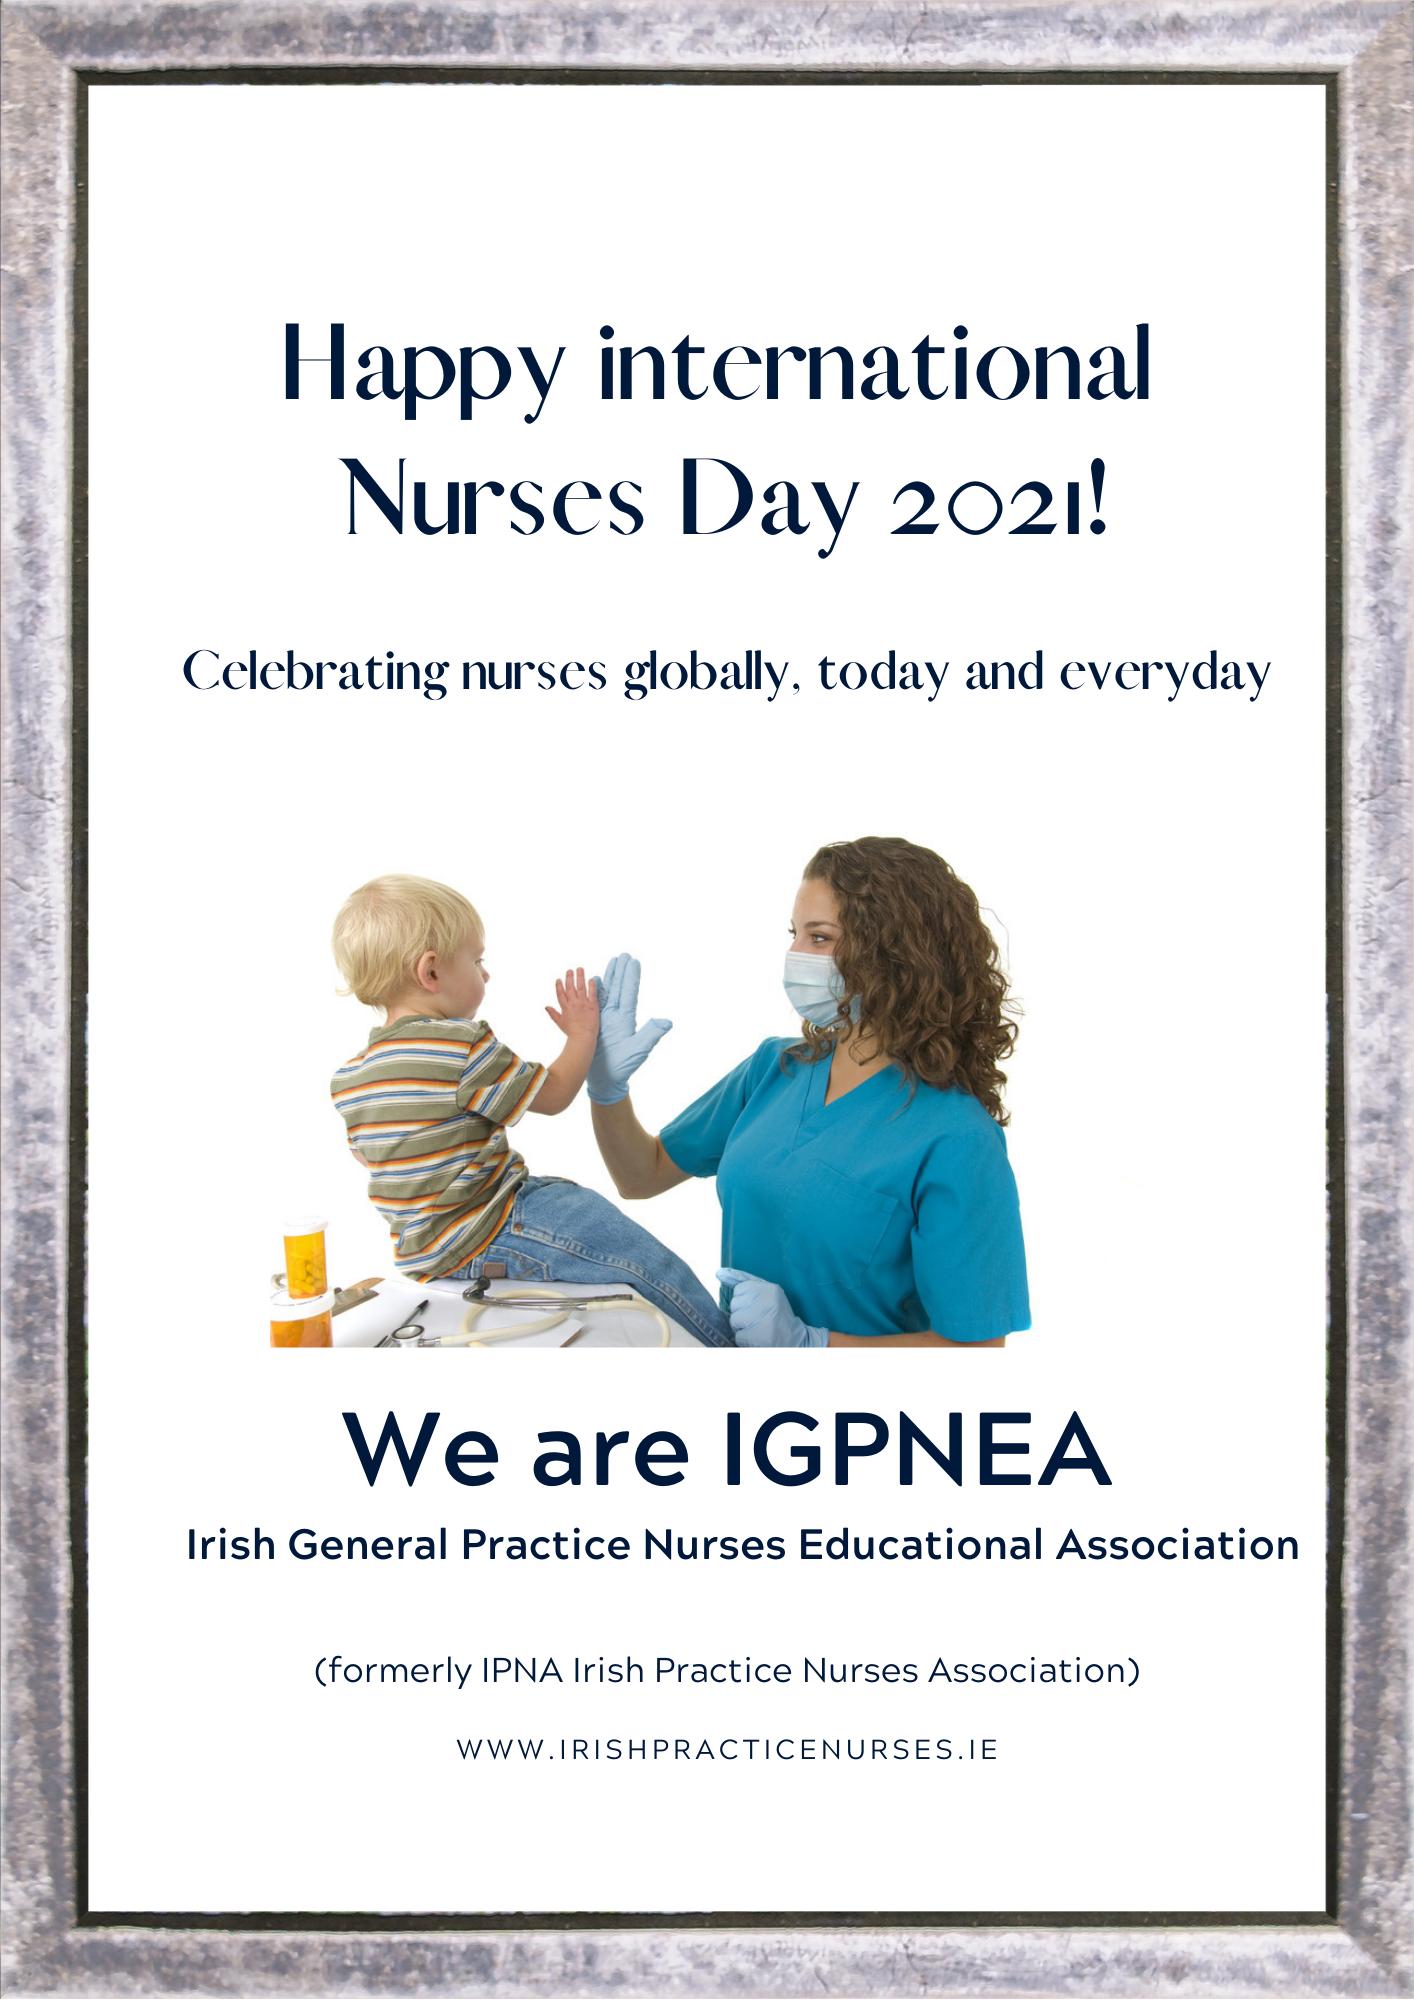 Happy International Nurses Day 2021!